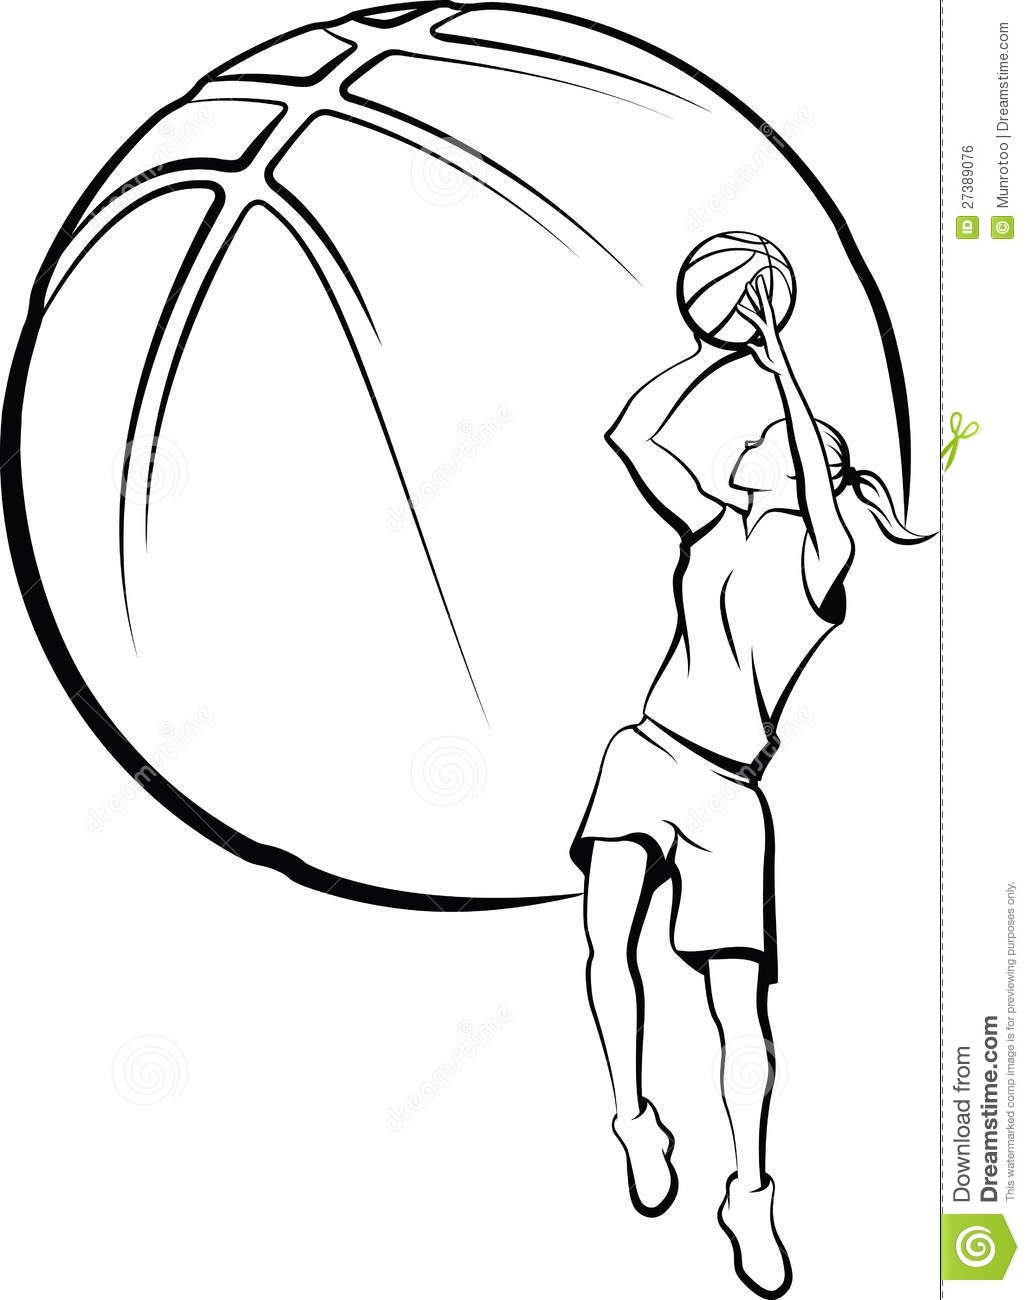 Basketball Outline Clipart